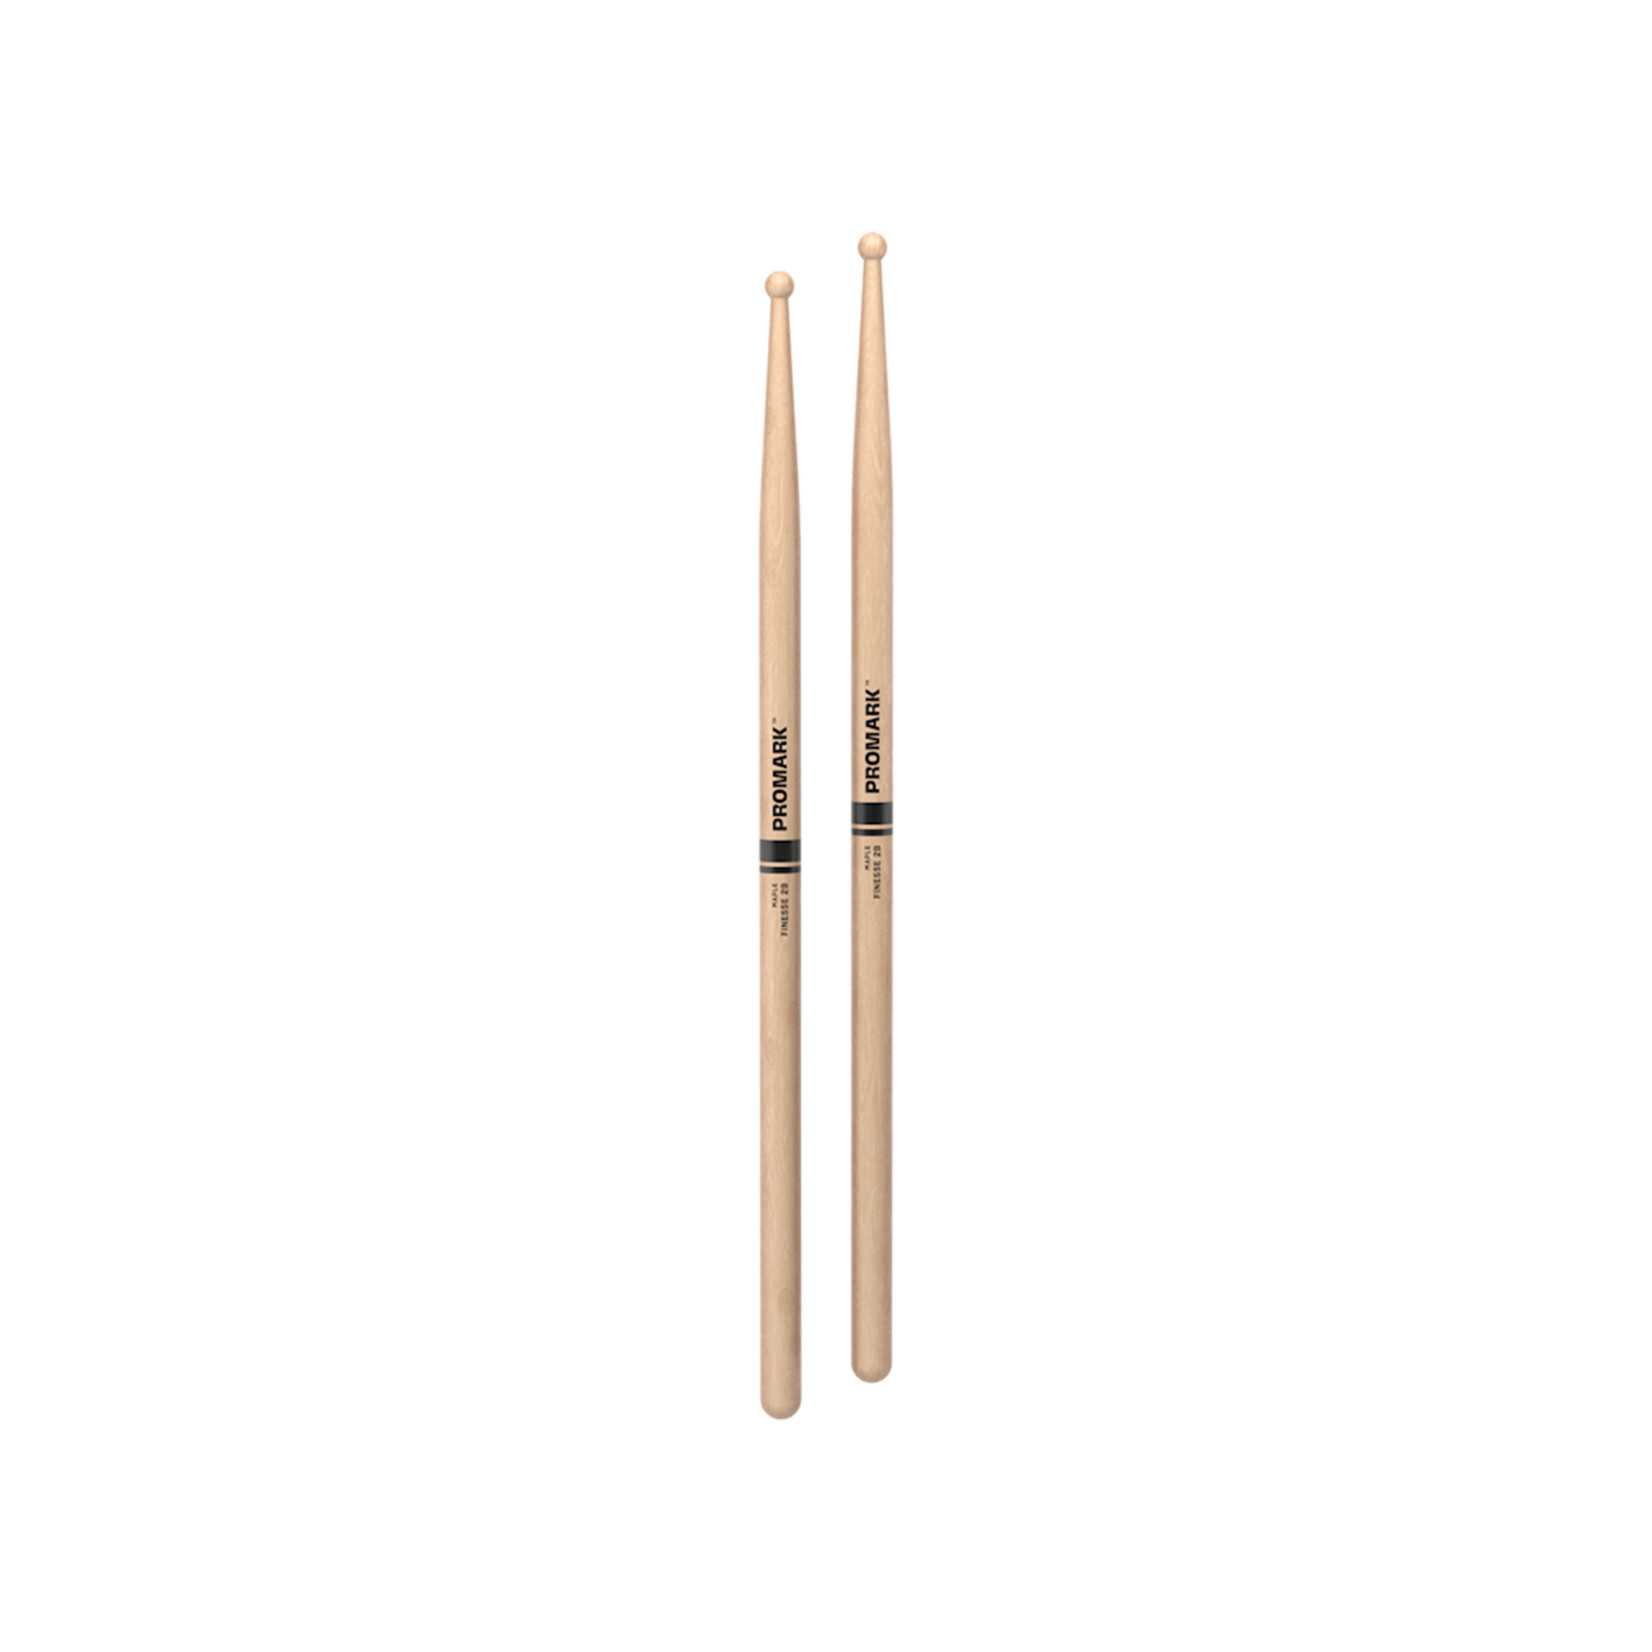 Promark ProMark Finesse 2B Maple Long Round Tip Drumstick